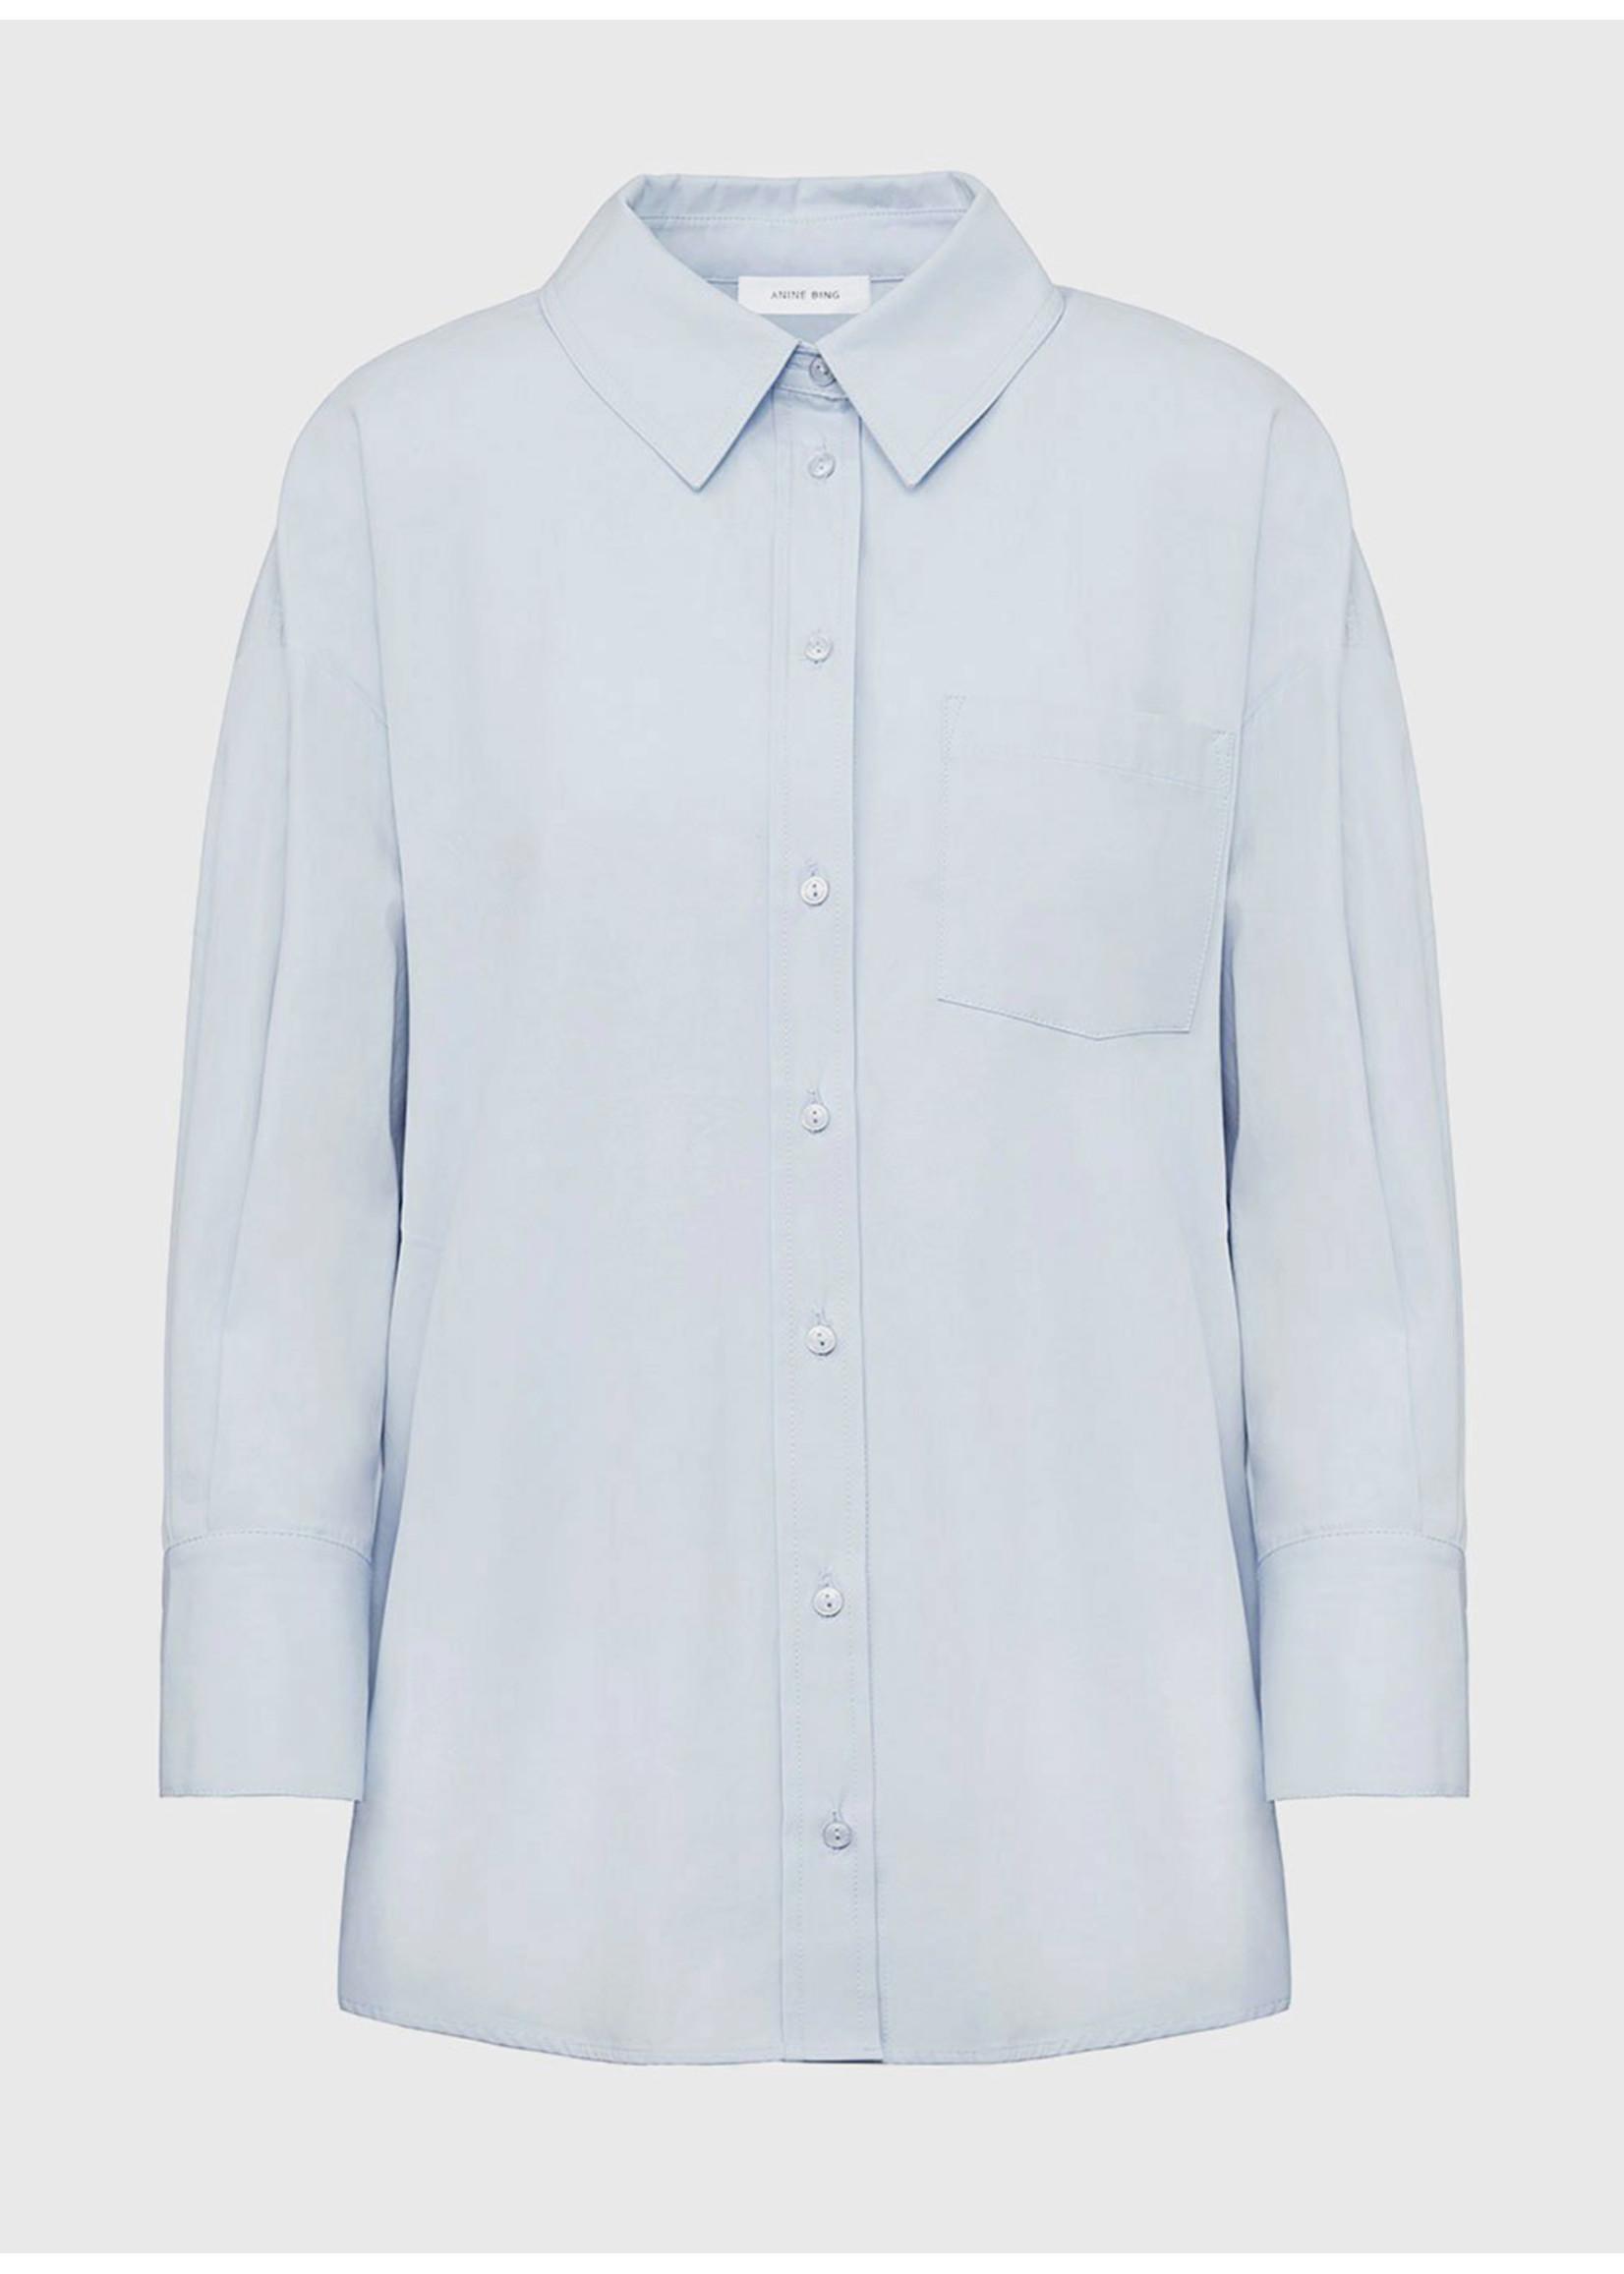 Anine Bing Mika Shirt Blue